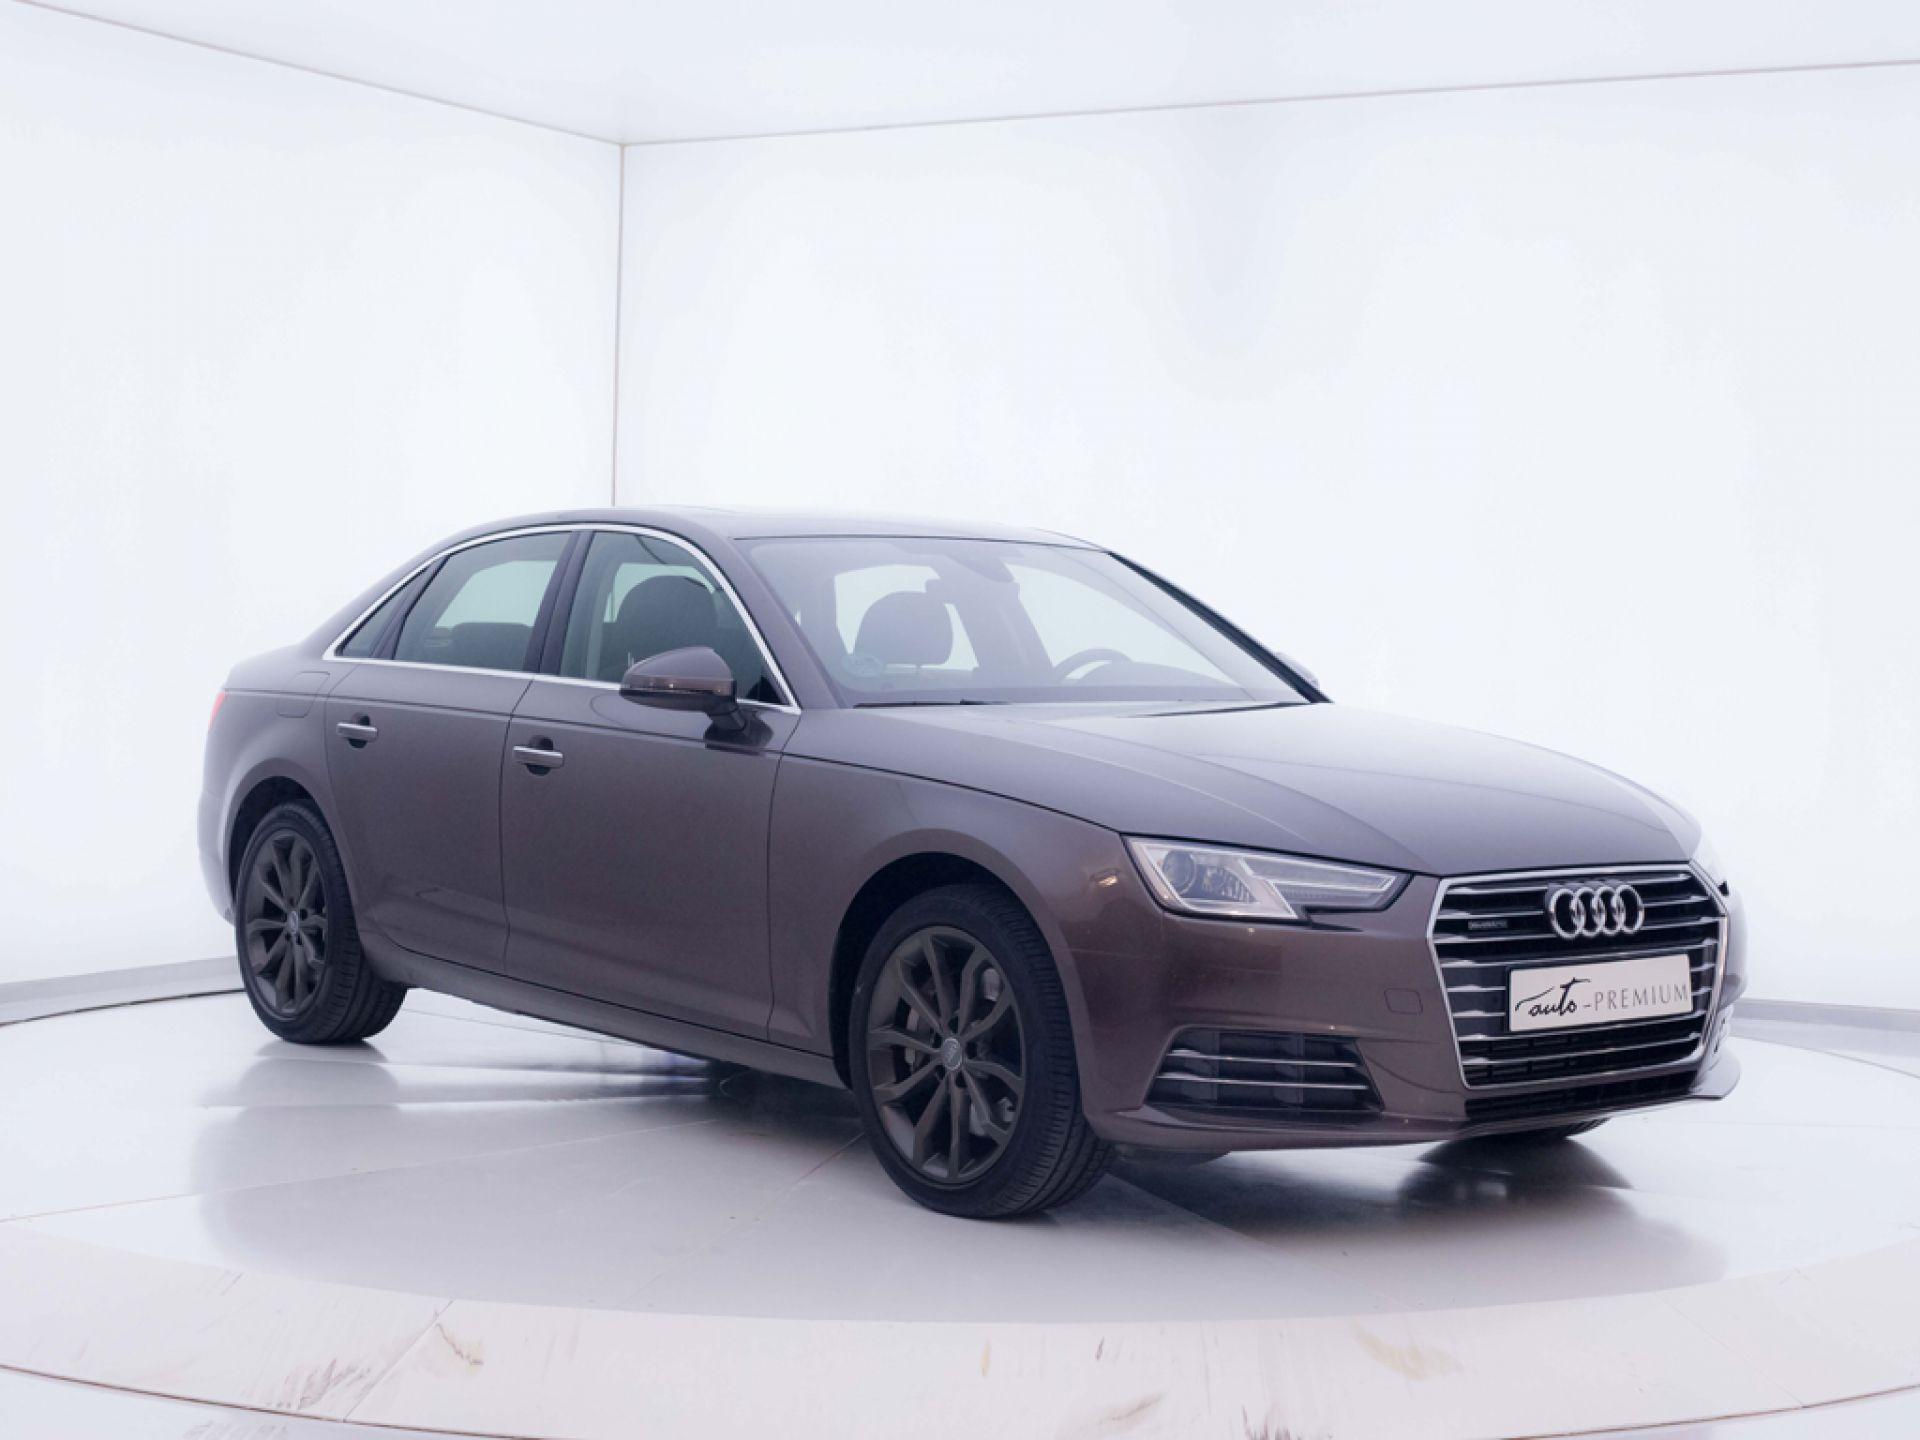 Audi A4 2.0 TFSI quattro S tronic design edition